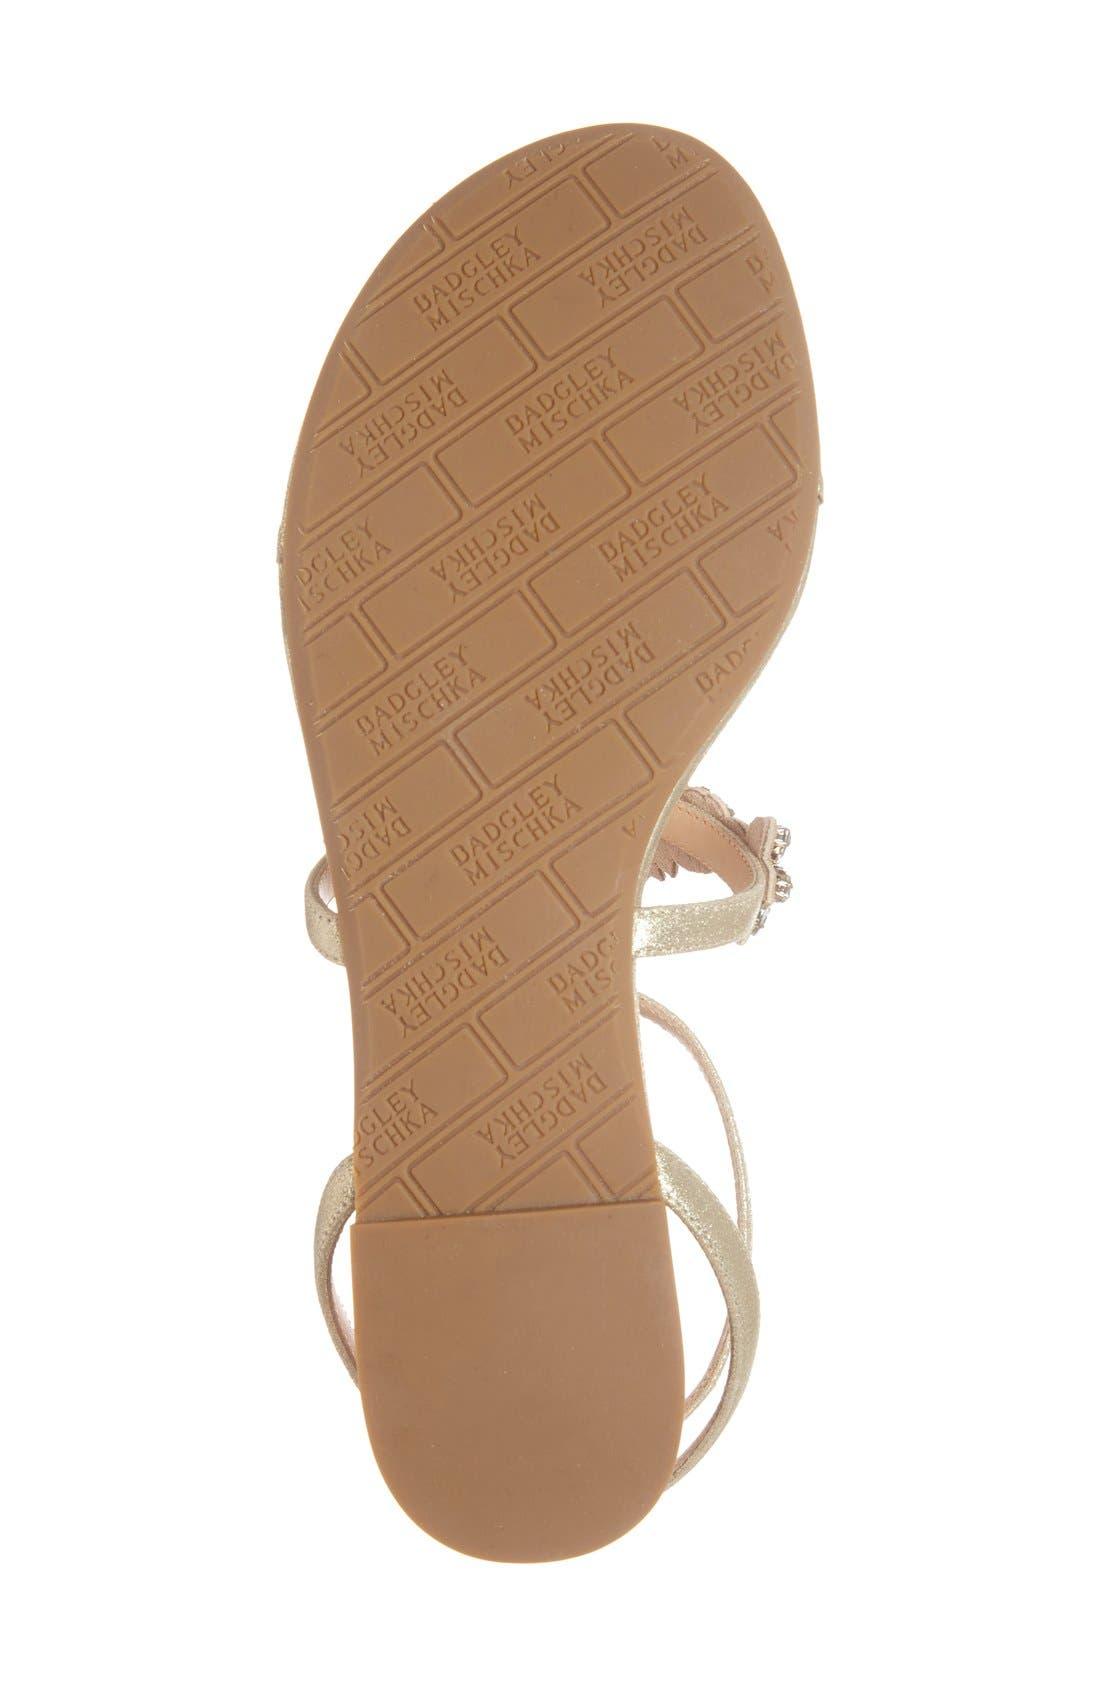 Badgley Mischka 'Cara' Crystal Embellished Flat Sandal,                             Alternate thumbnail 2, color,                             710